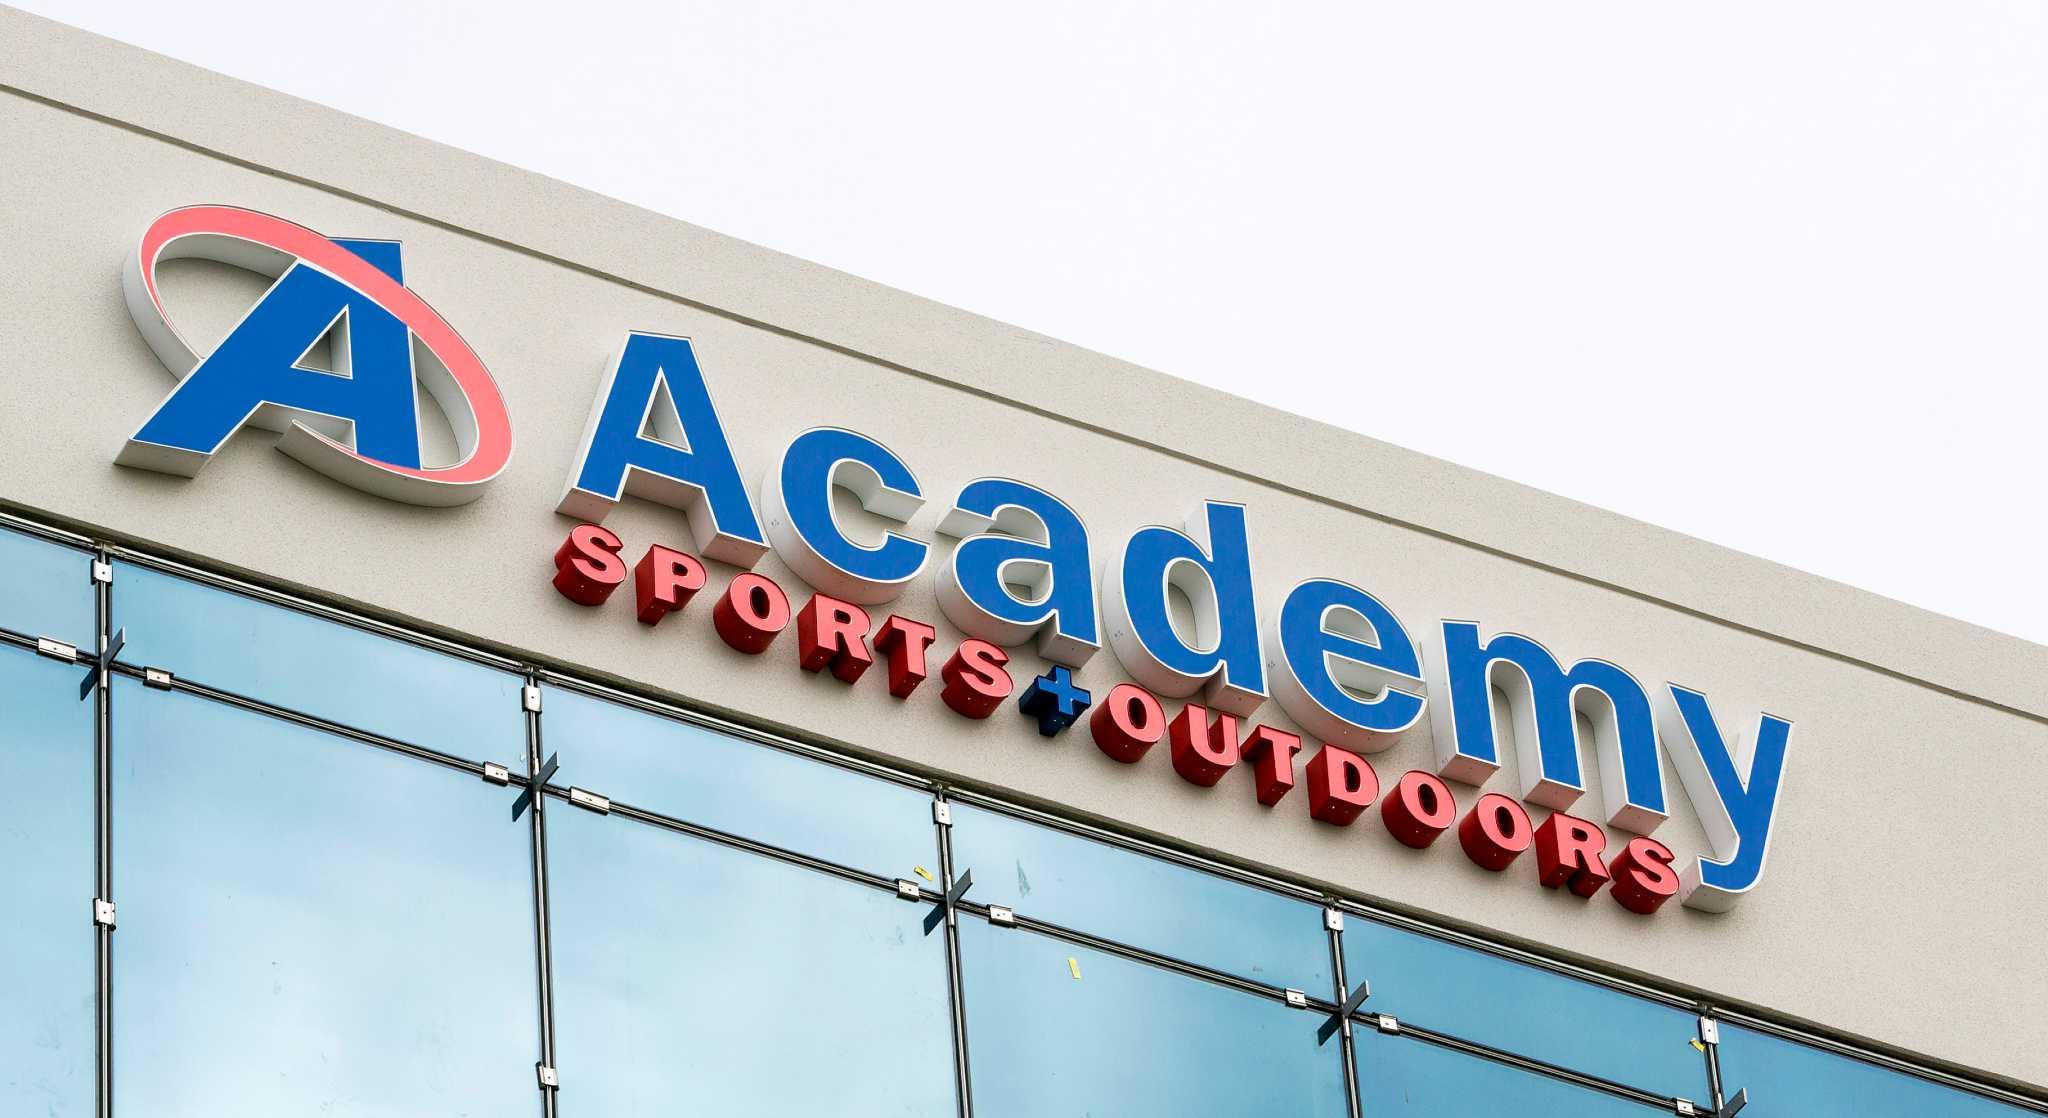 academy sports outdoors distribution center gun texas hartley sysco tennessee friday mason headquarters 1800 katy chronicle craig chron layoffs deals